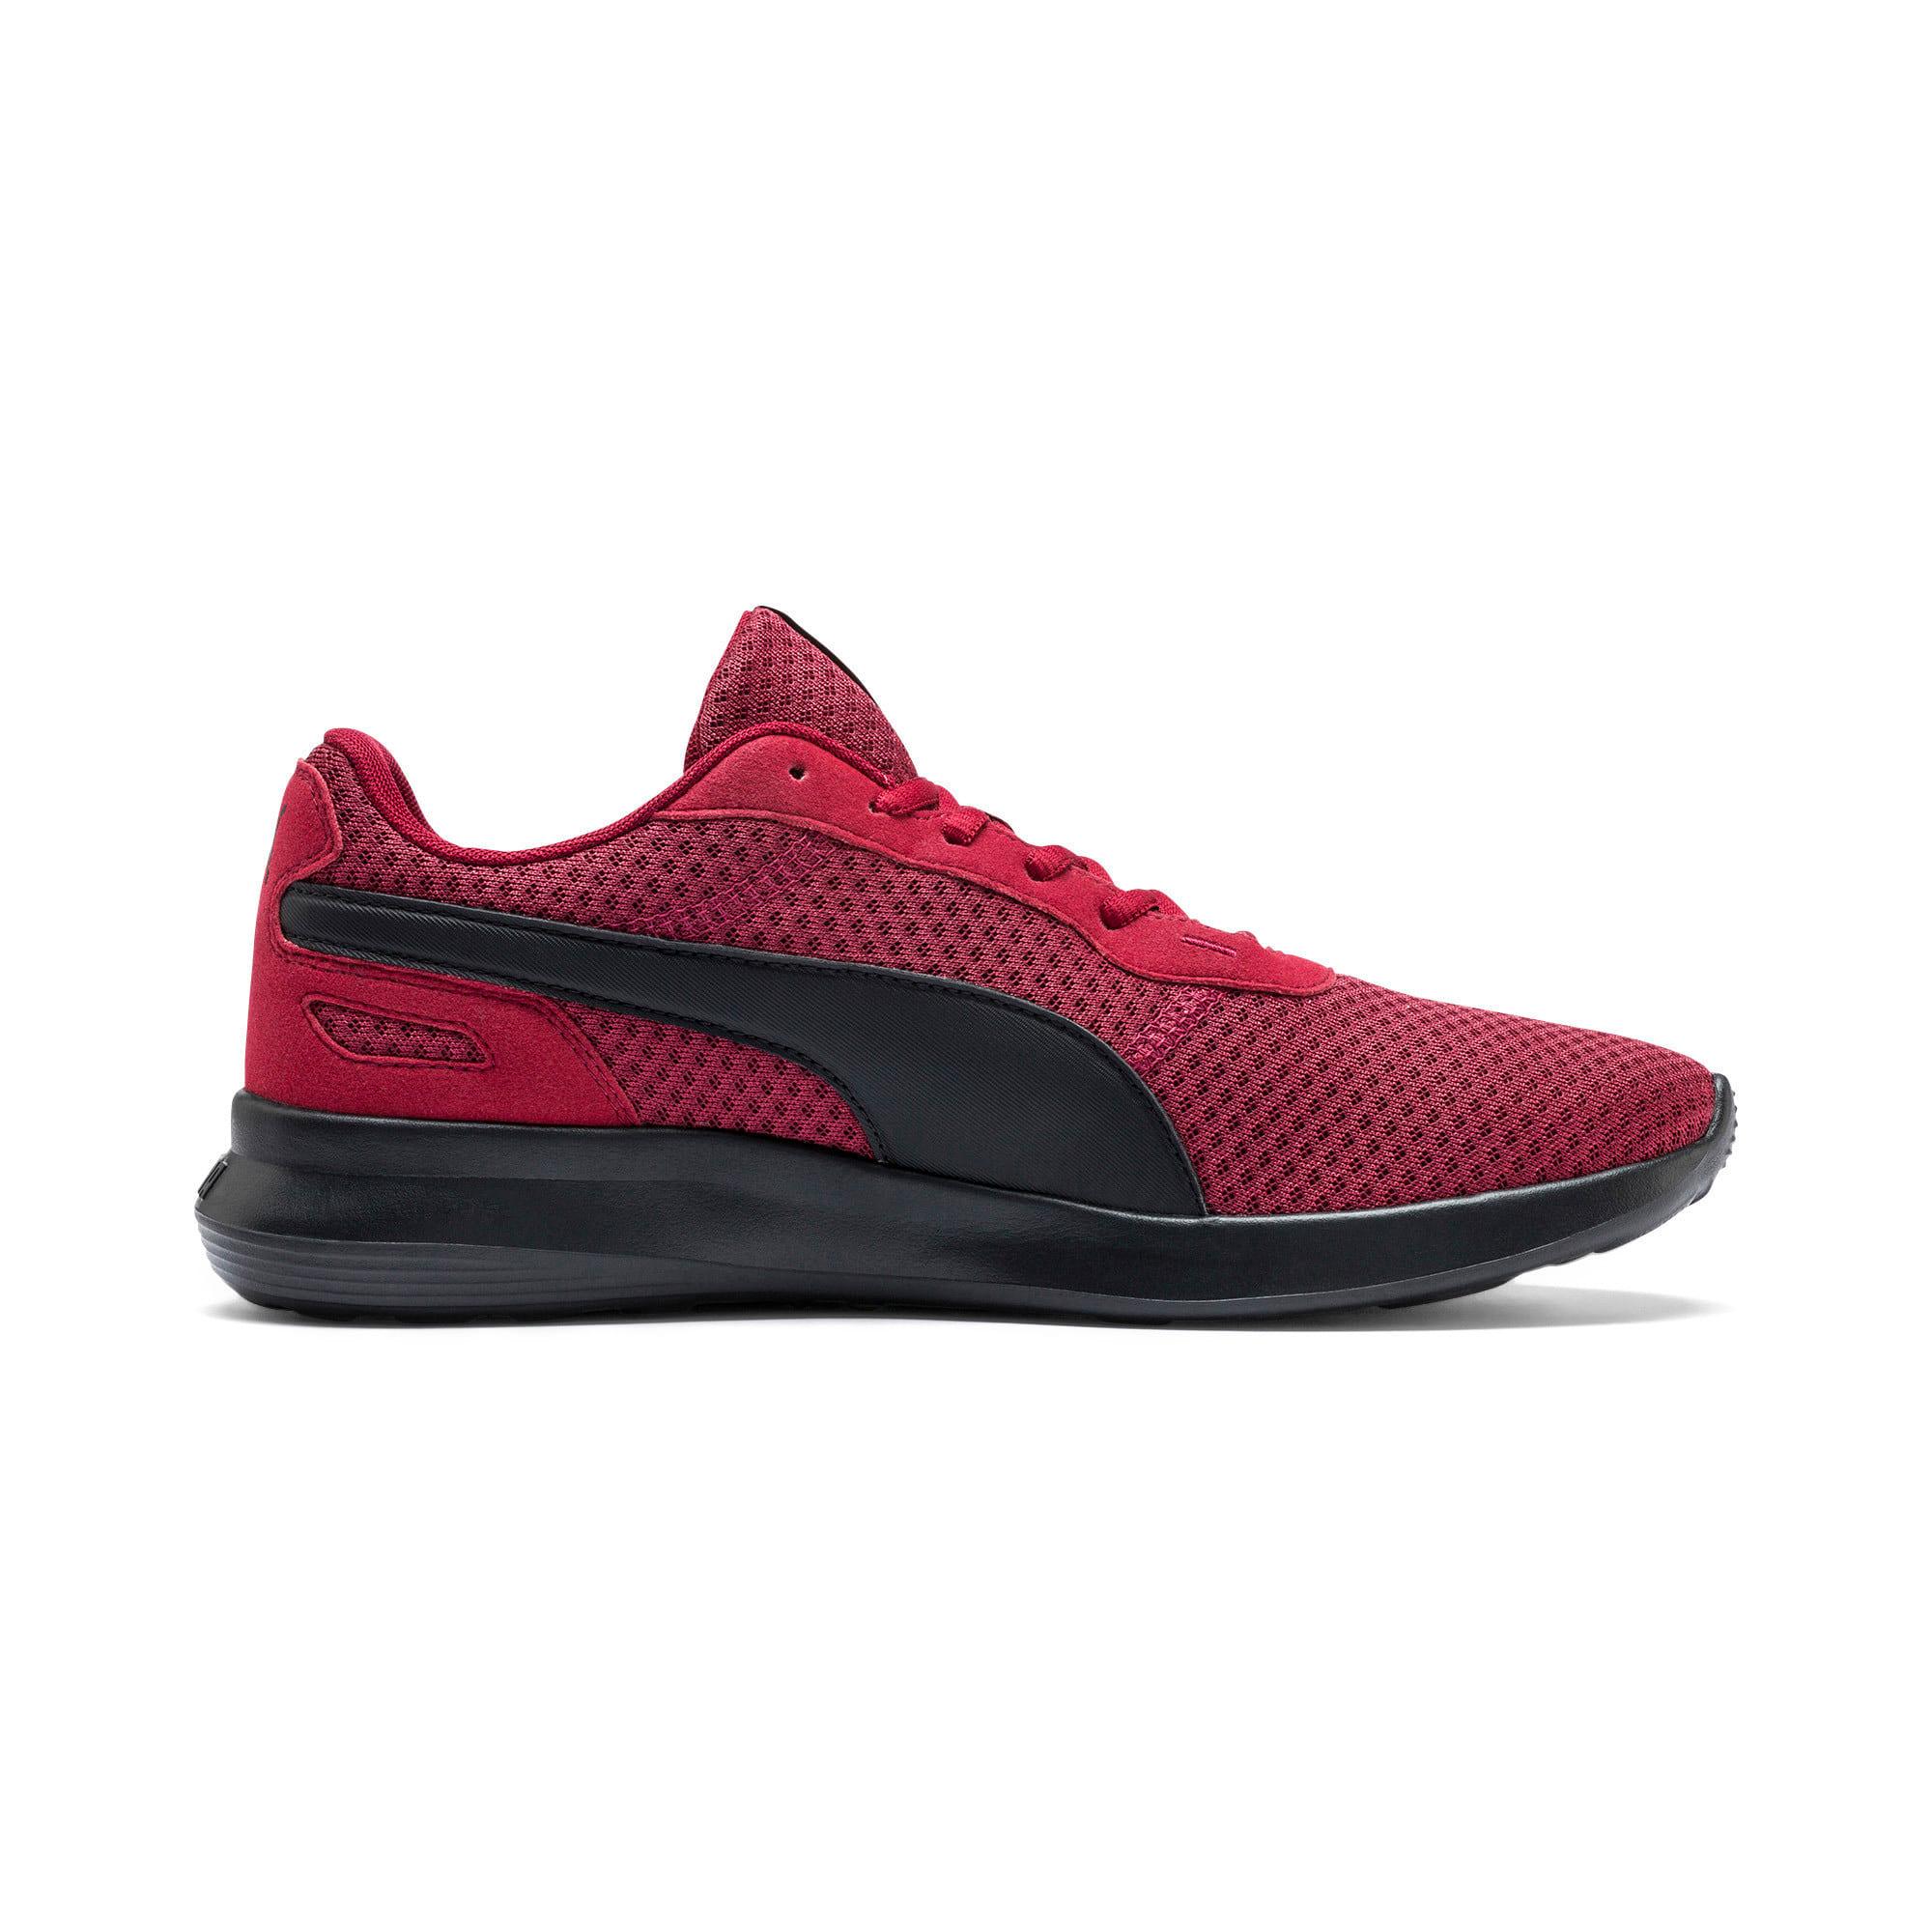 Thumbnail 6 of ST Activate Sneakers, Rhubarb-Puma Black, medium